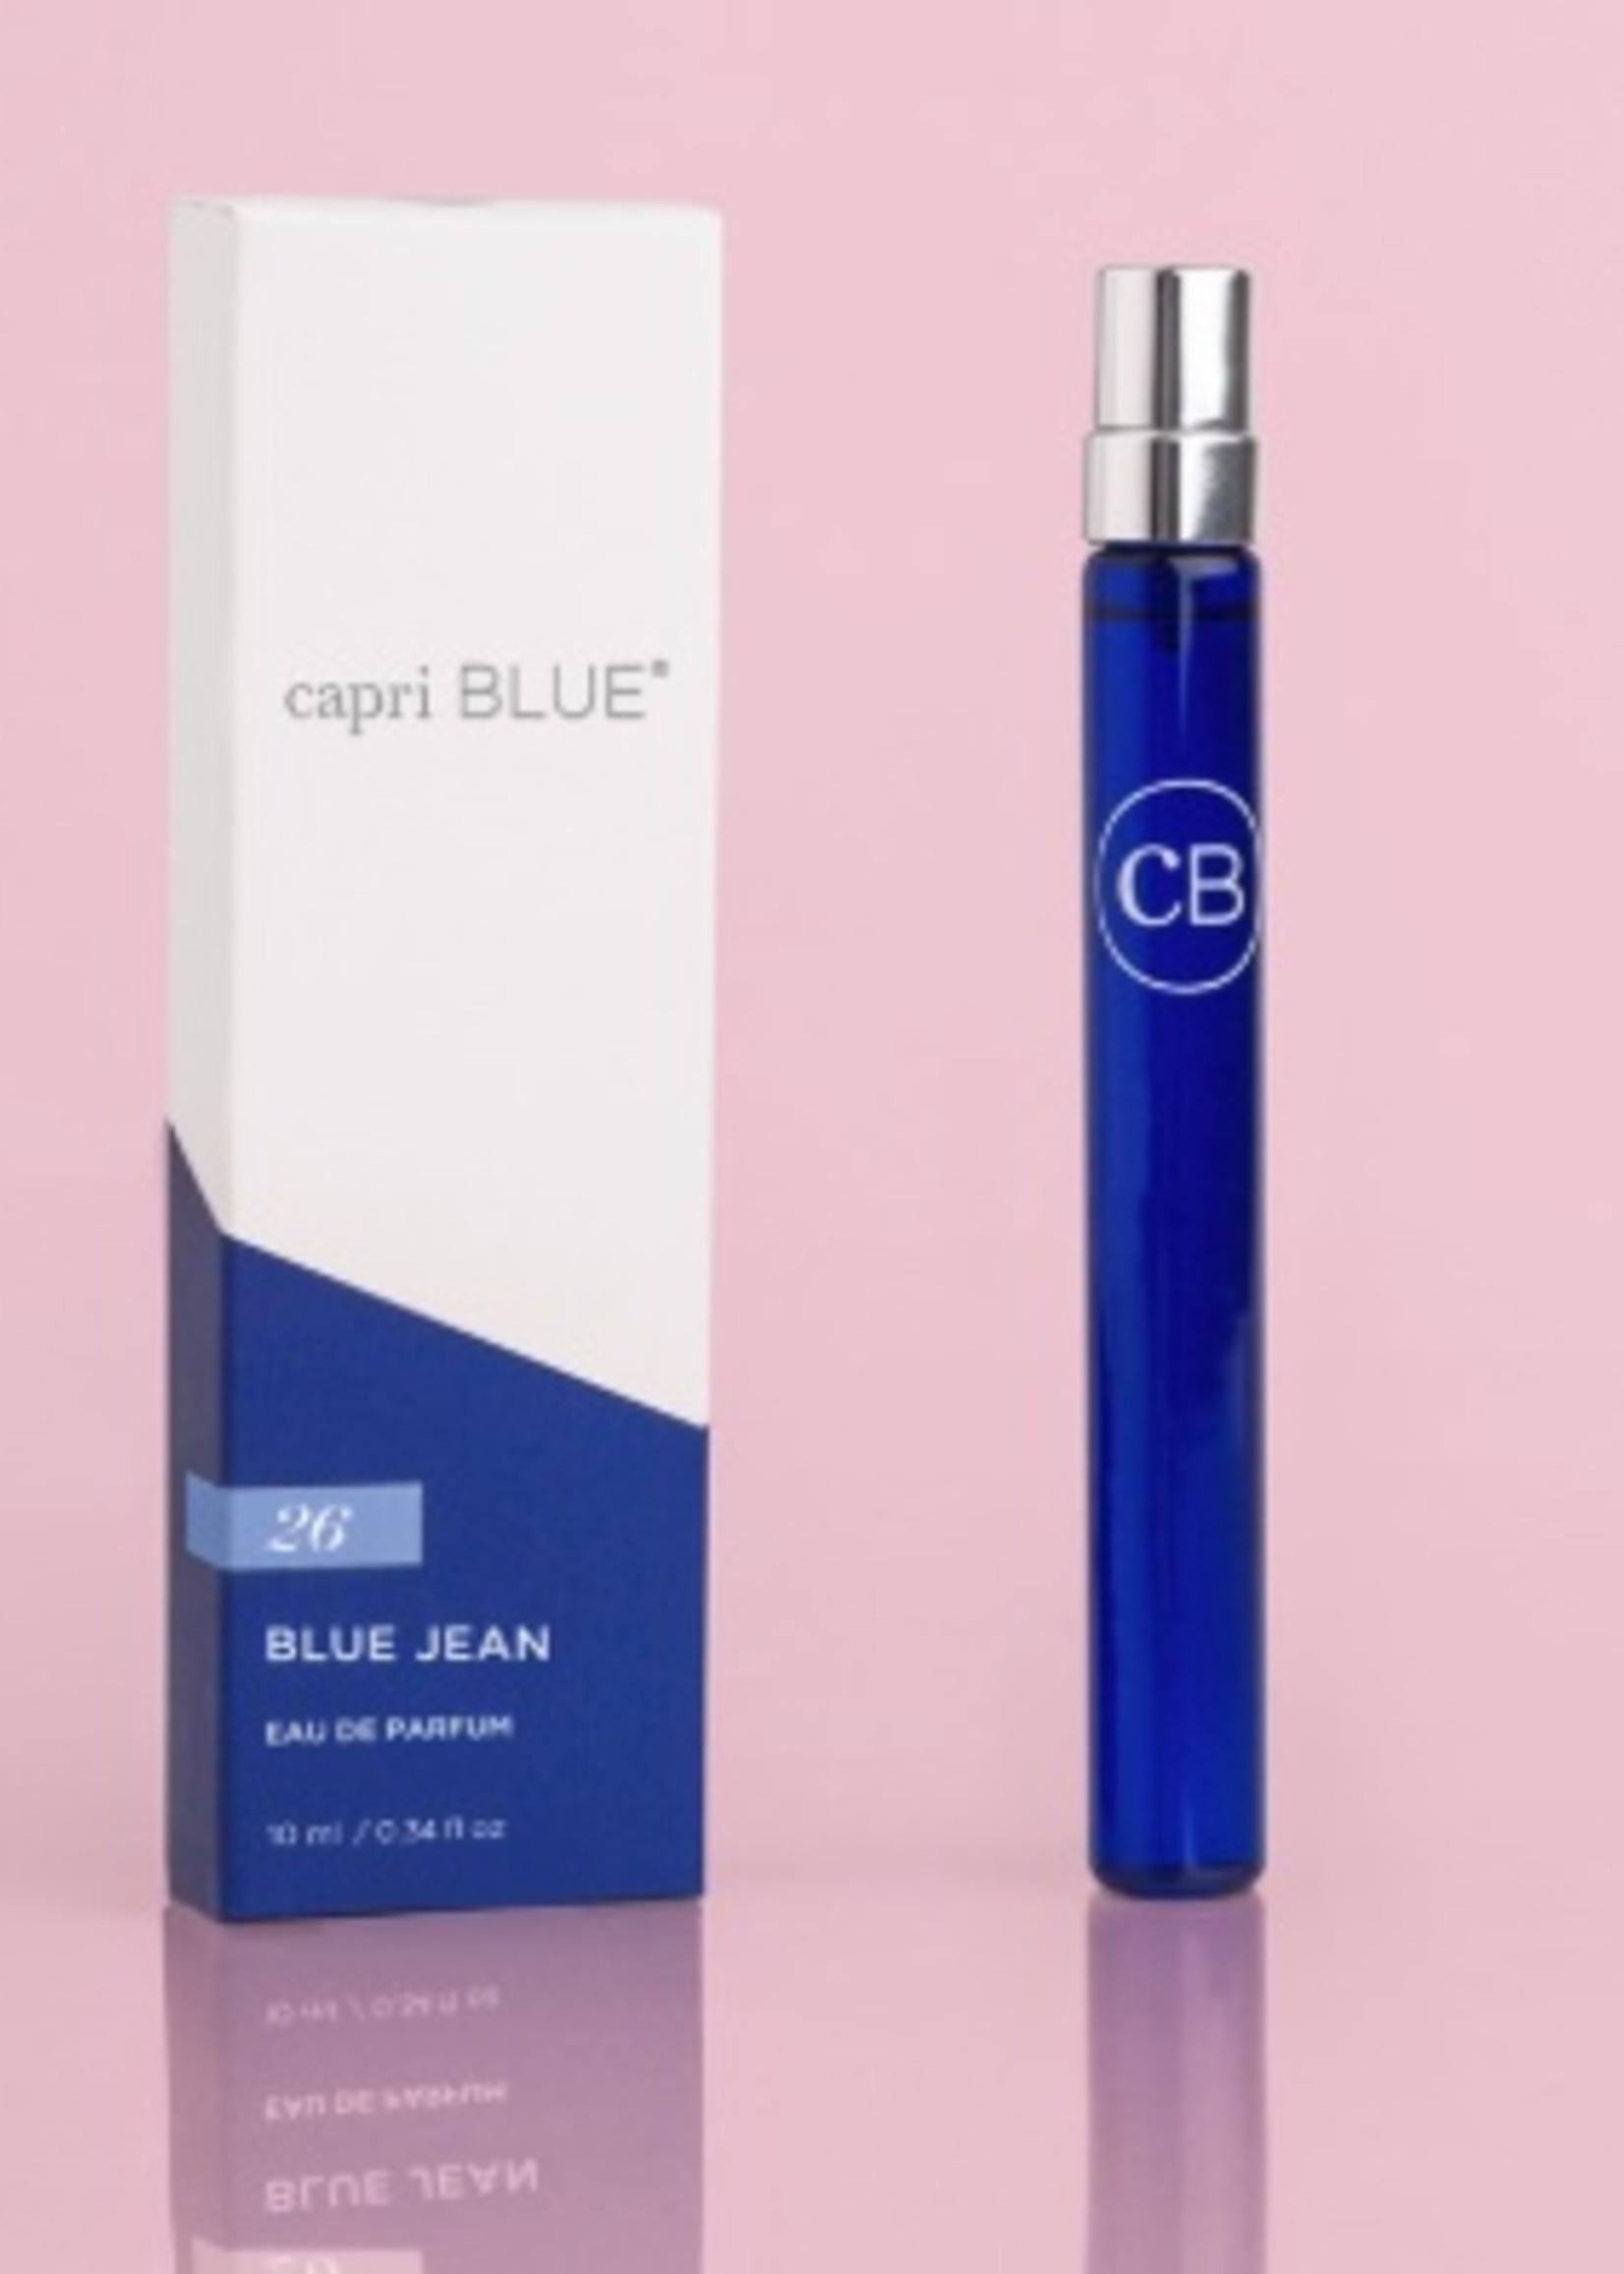 Capri Blue Perfume Spray Pen